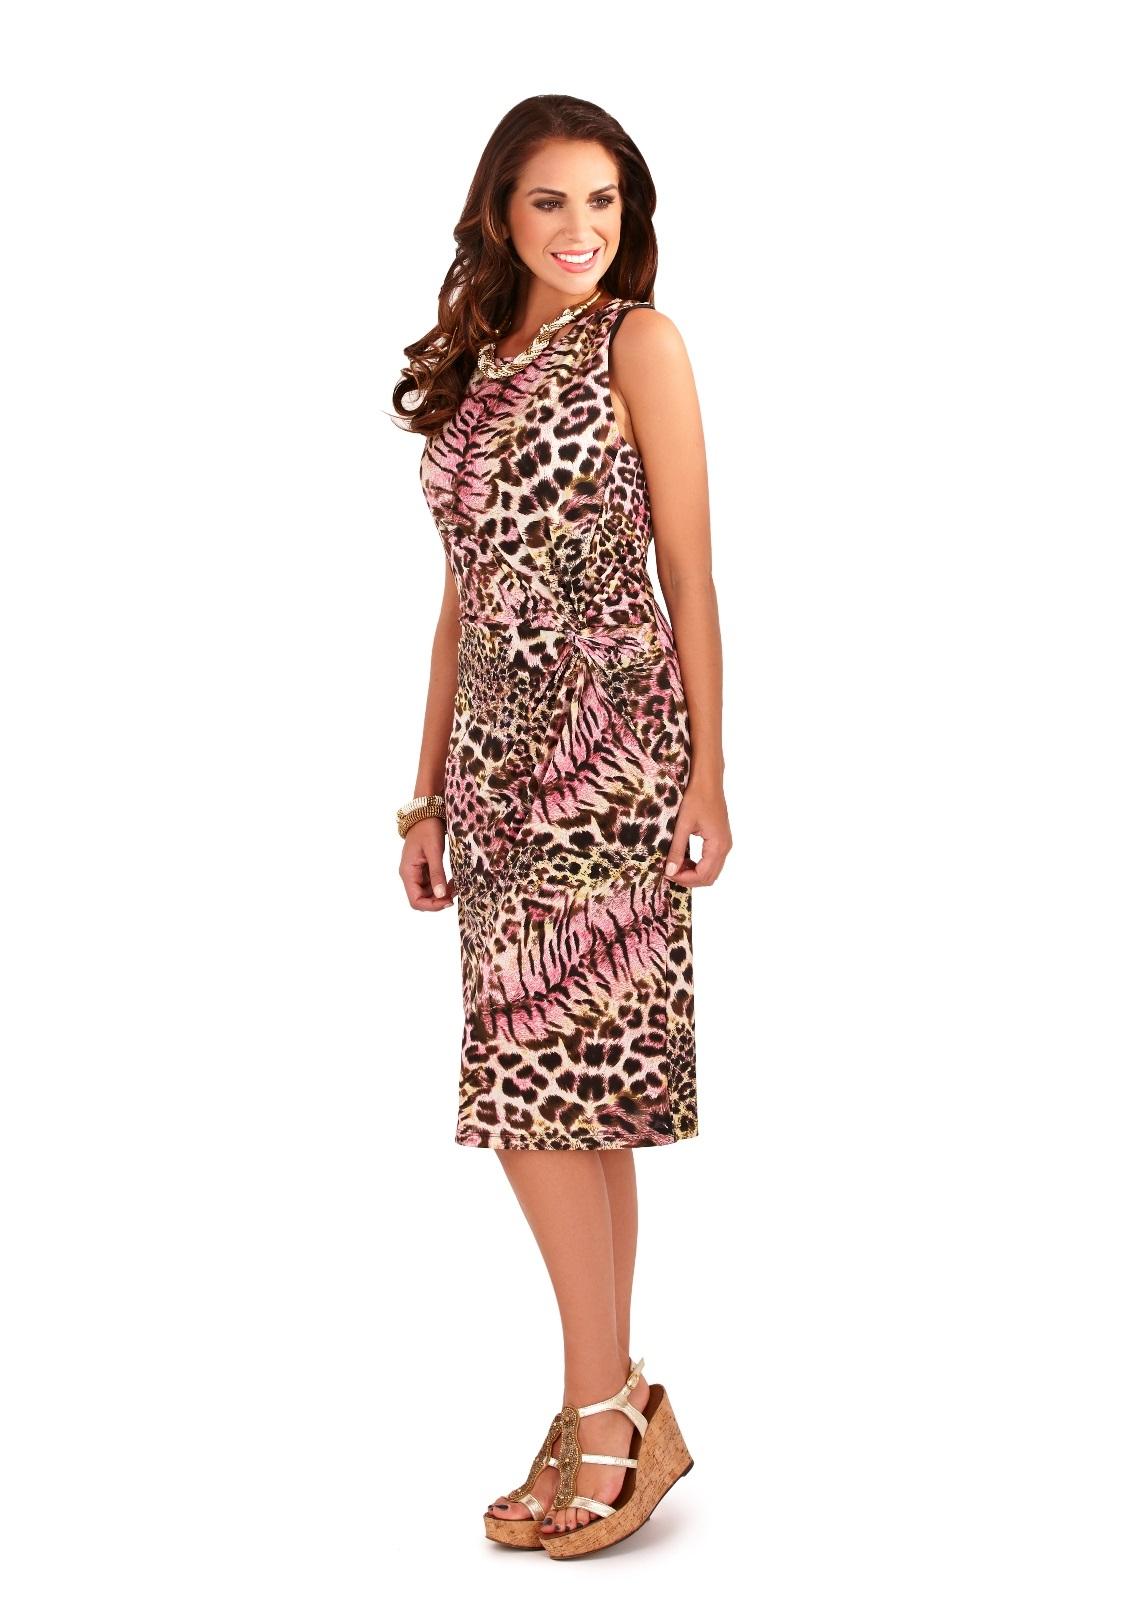 Innovative Party Dress Girls - Dress Yp